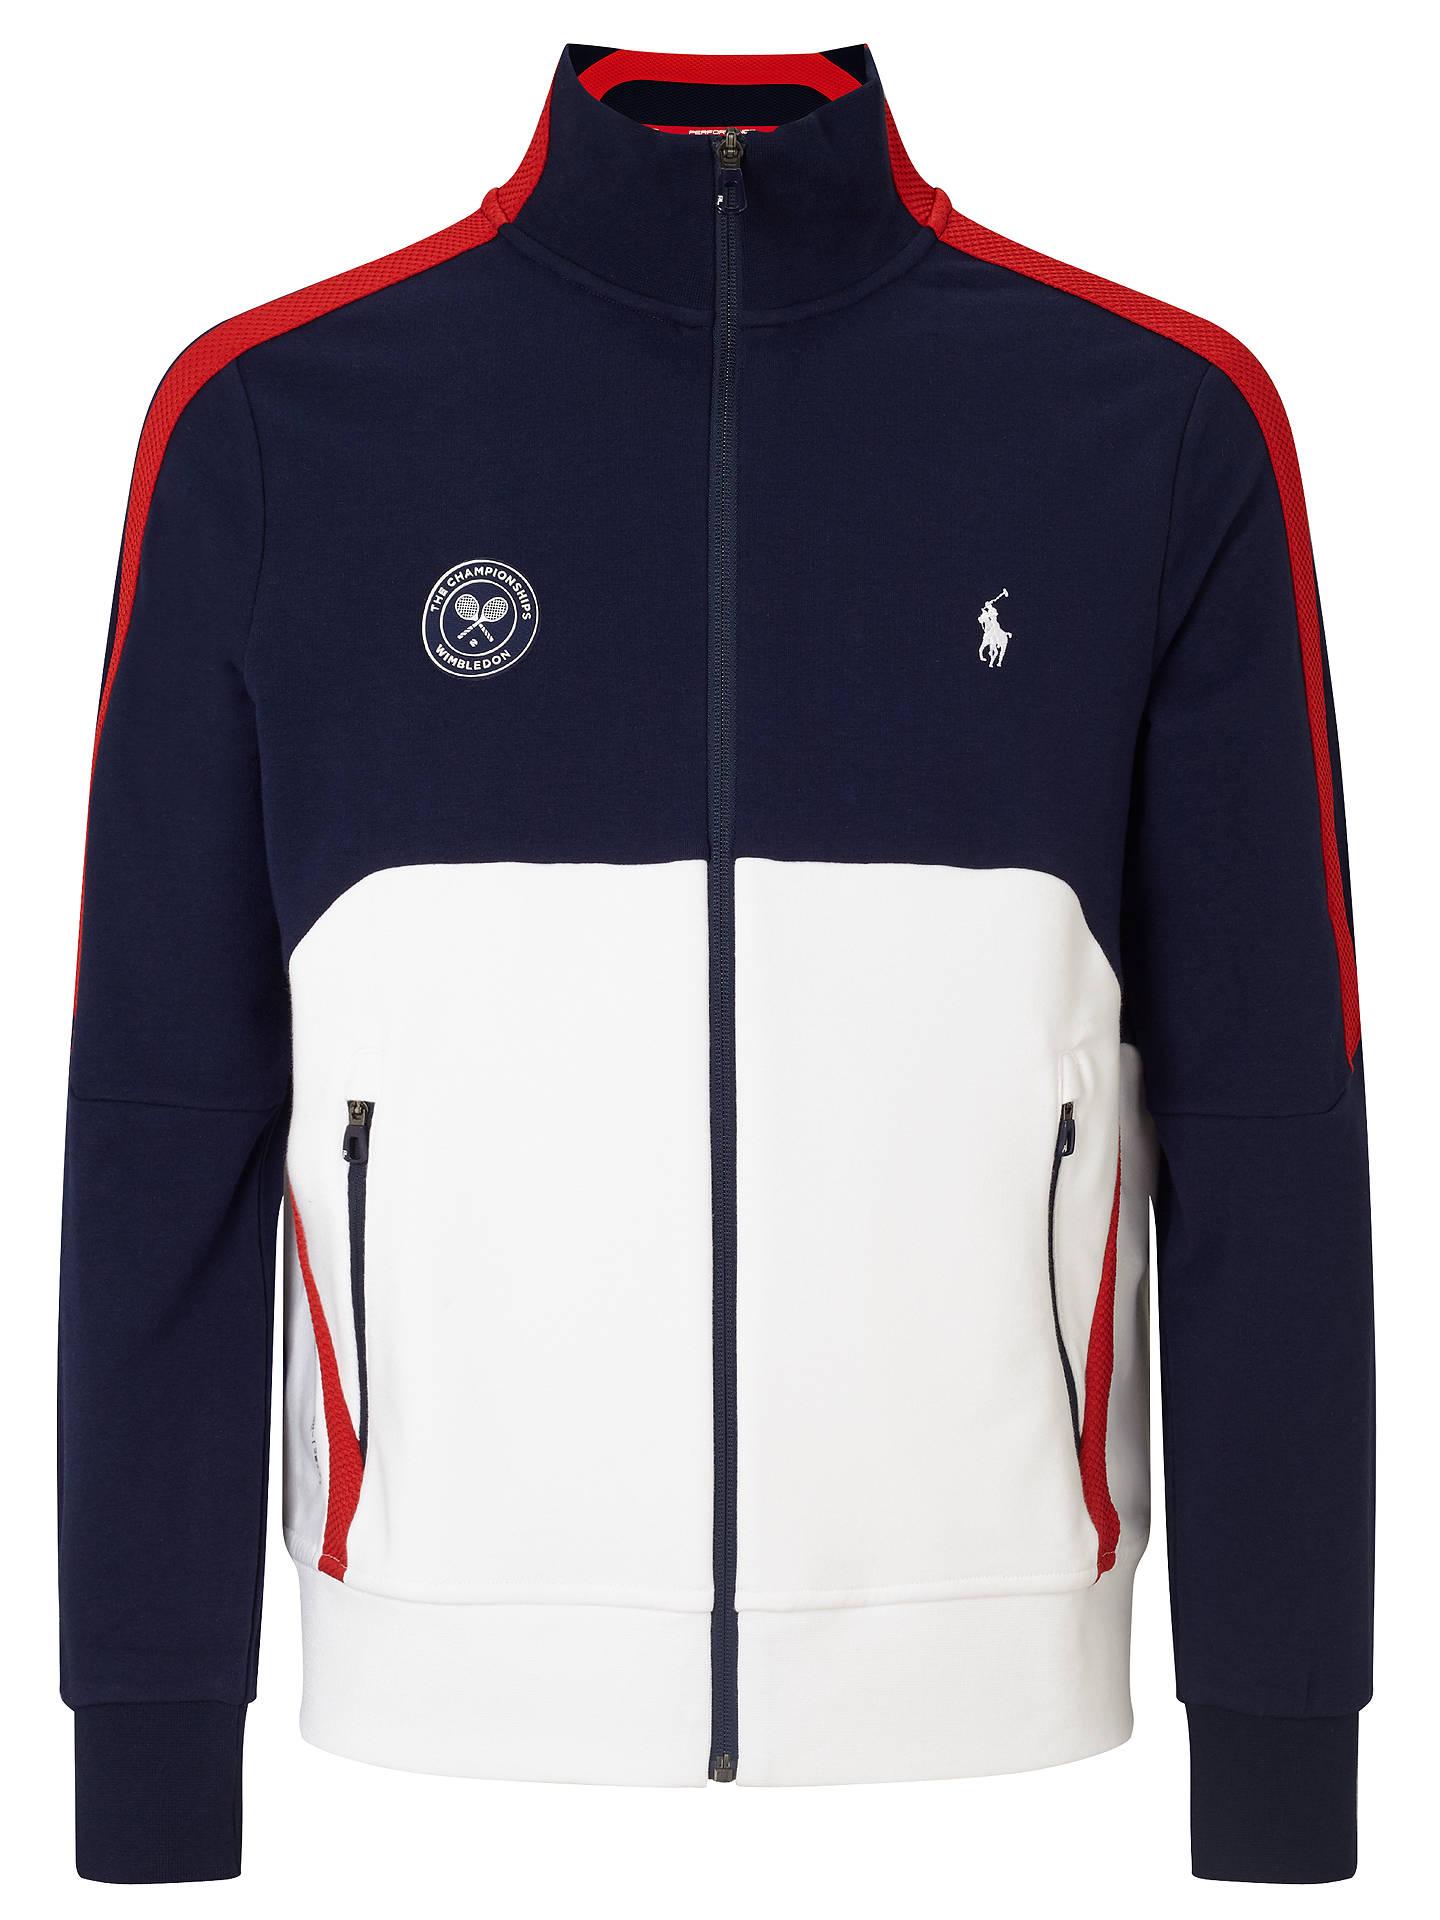 Support Track Polo Lauren 2017 JacketFrench Wimbledon Stripe Ralph uPXkZi